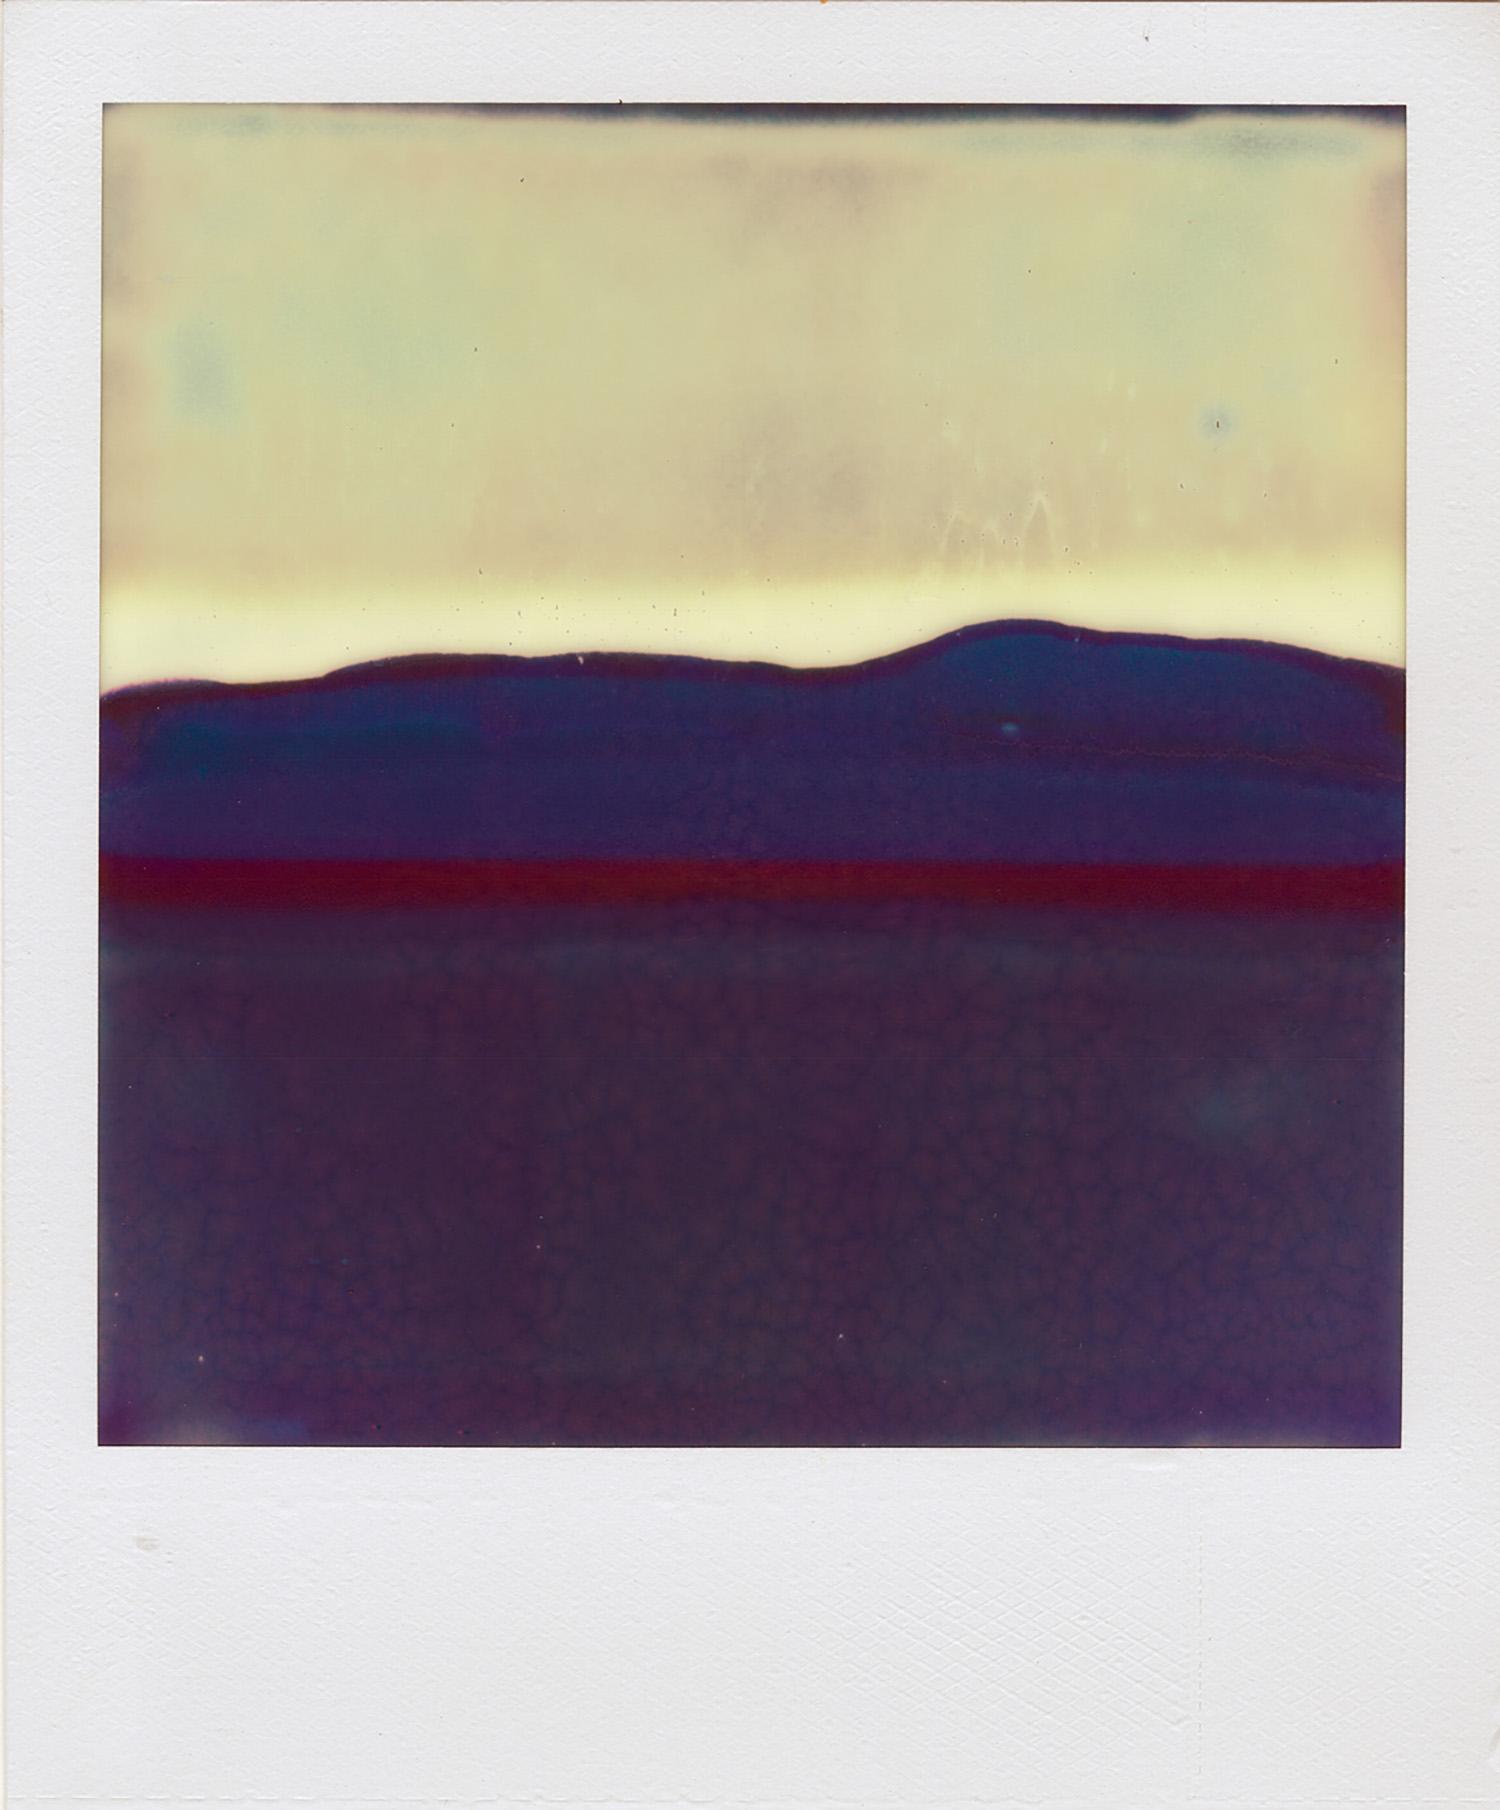 Ruined Polaroid #3, 2011